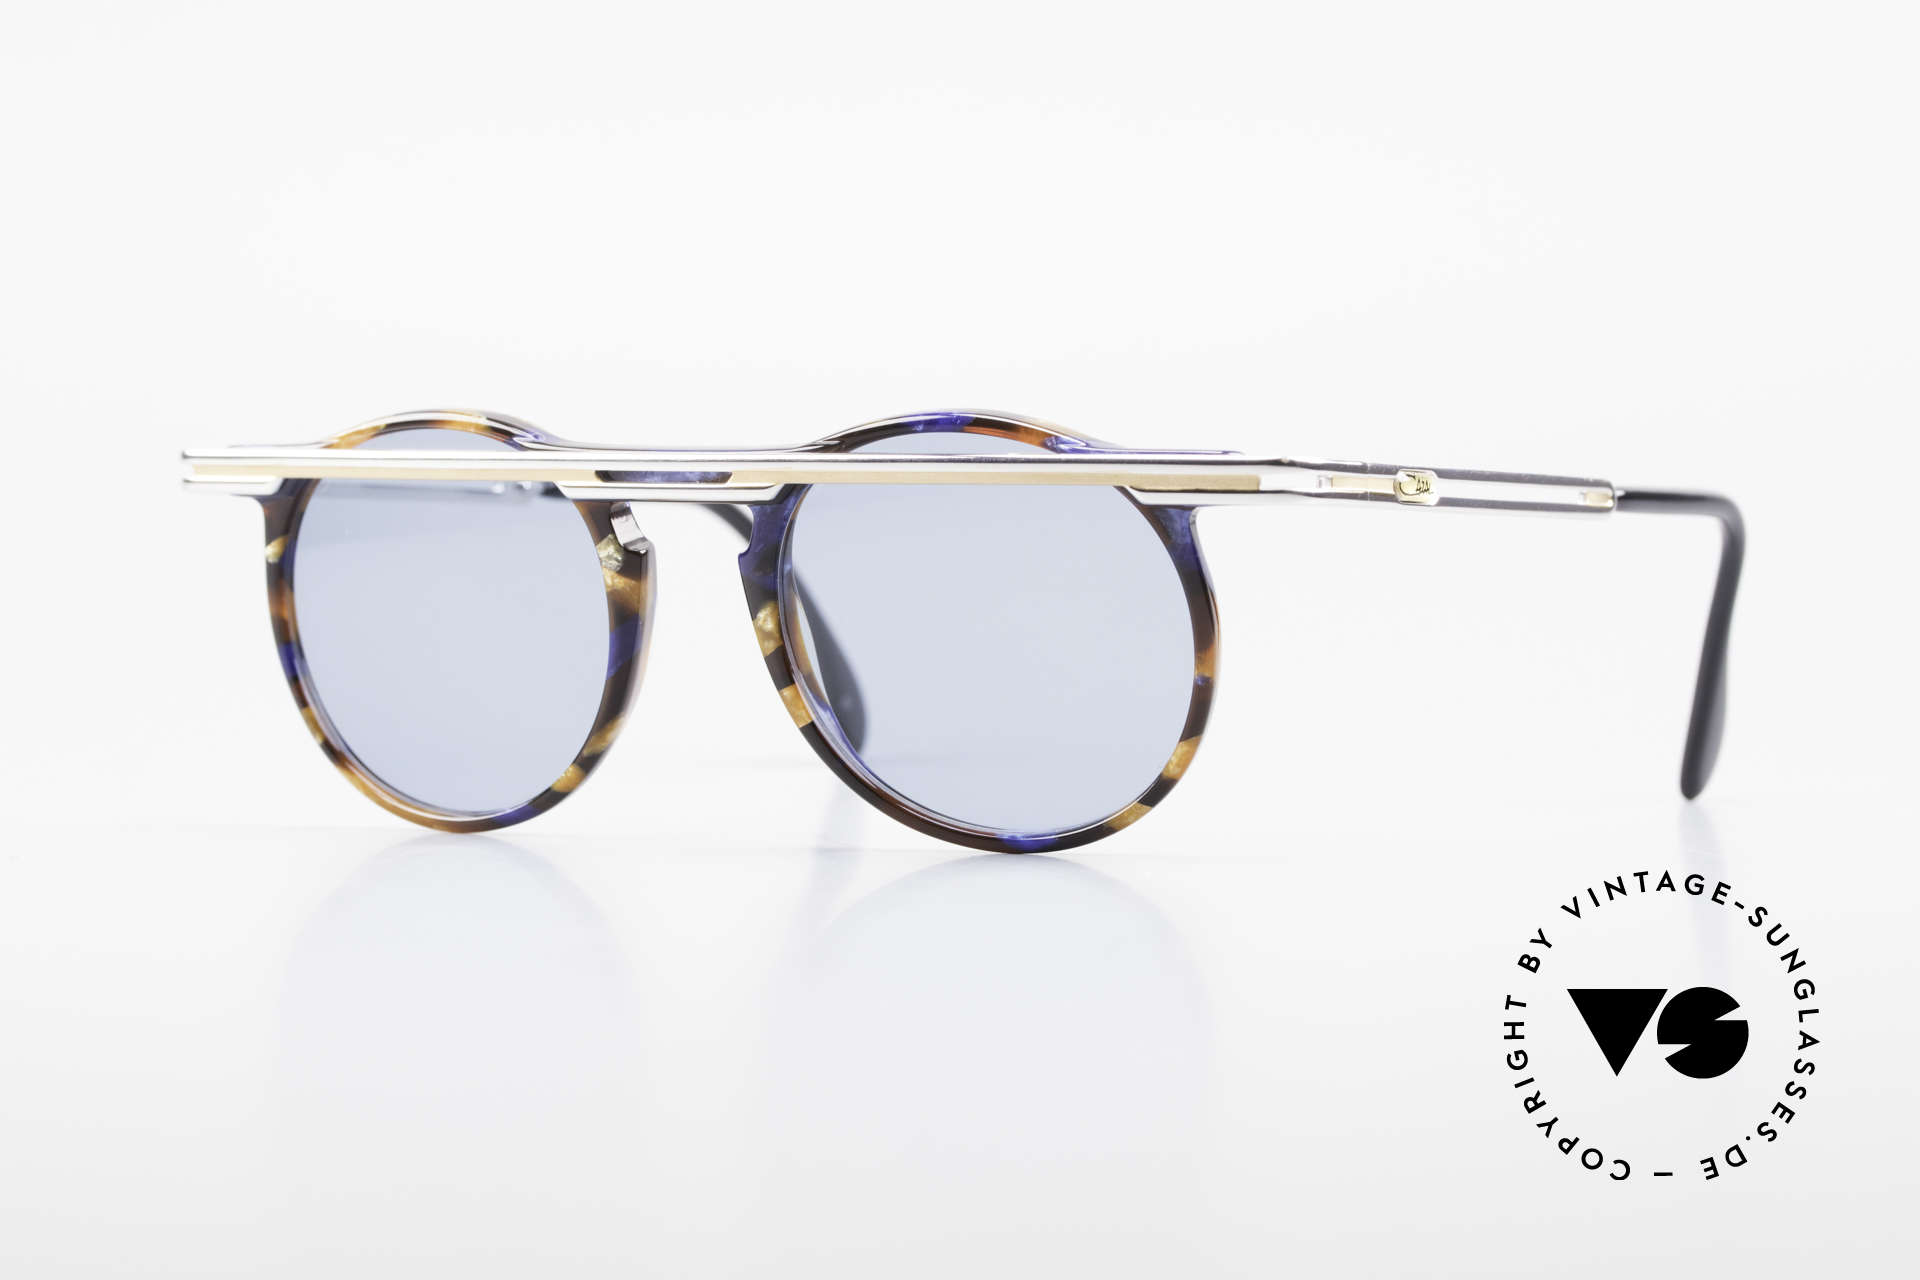 Cazal 648 Old Cari Zalloni Sunglasses, extraordinary CAZAL vintage sunglasses from 1990, Made for Men and Women